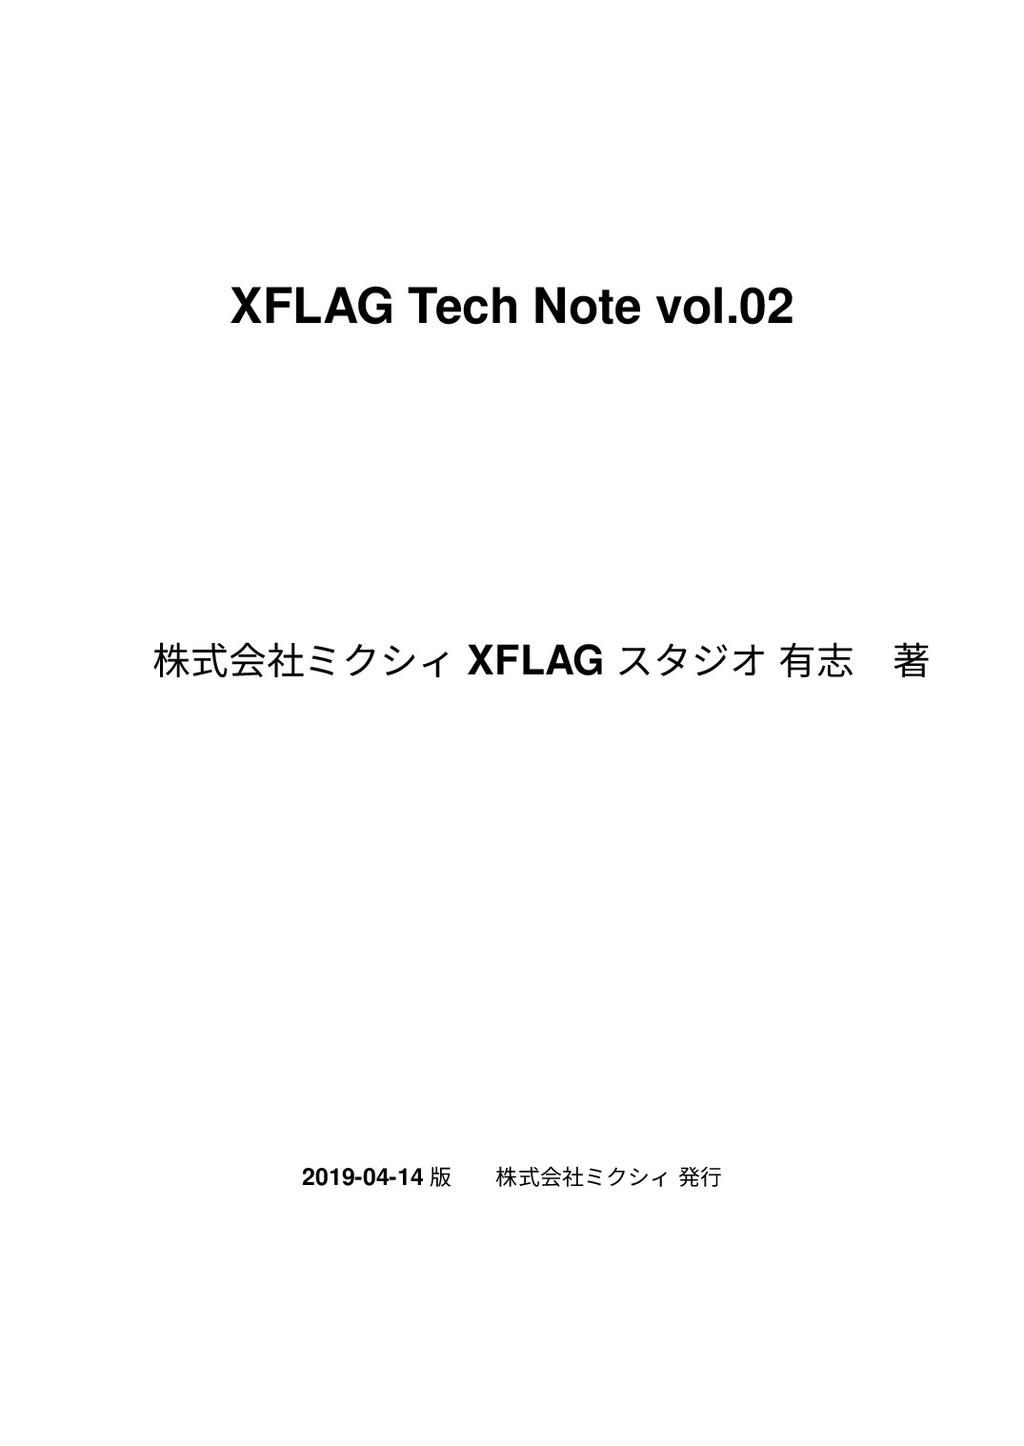 XFLAG Tech Note vol.02 株式会社ミクシィ XFLAG スタジオ 有志著...